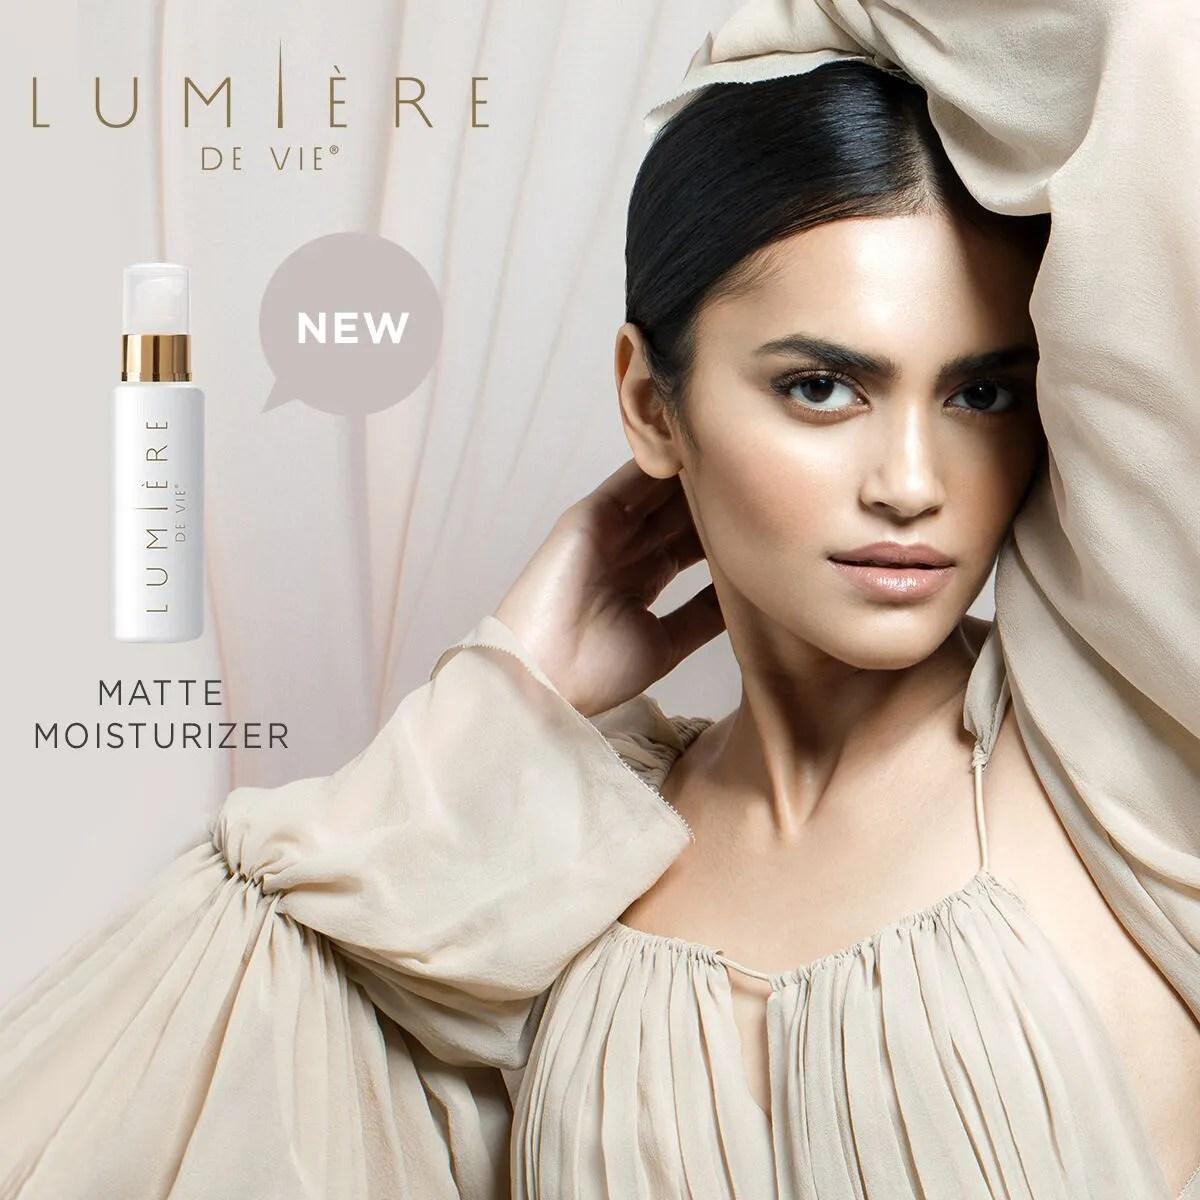 Introducing Lumiere de Vie Matte Moisturizer